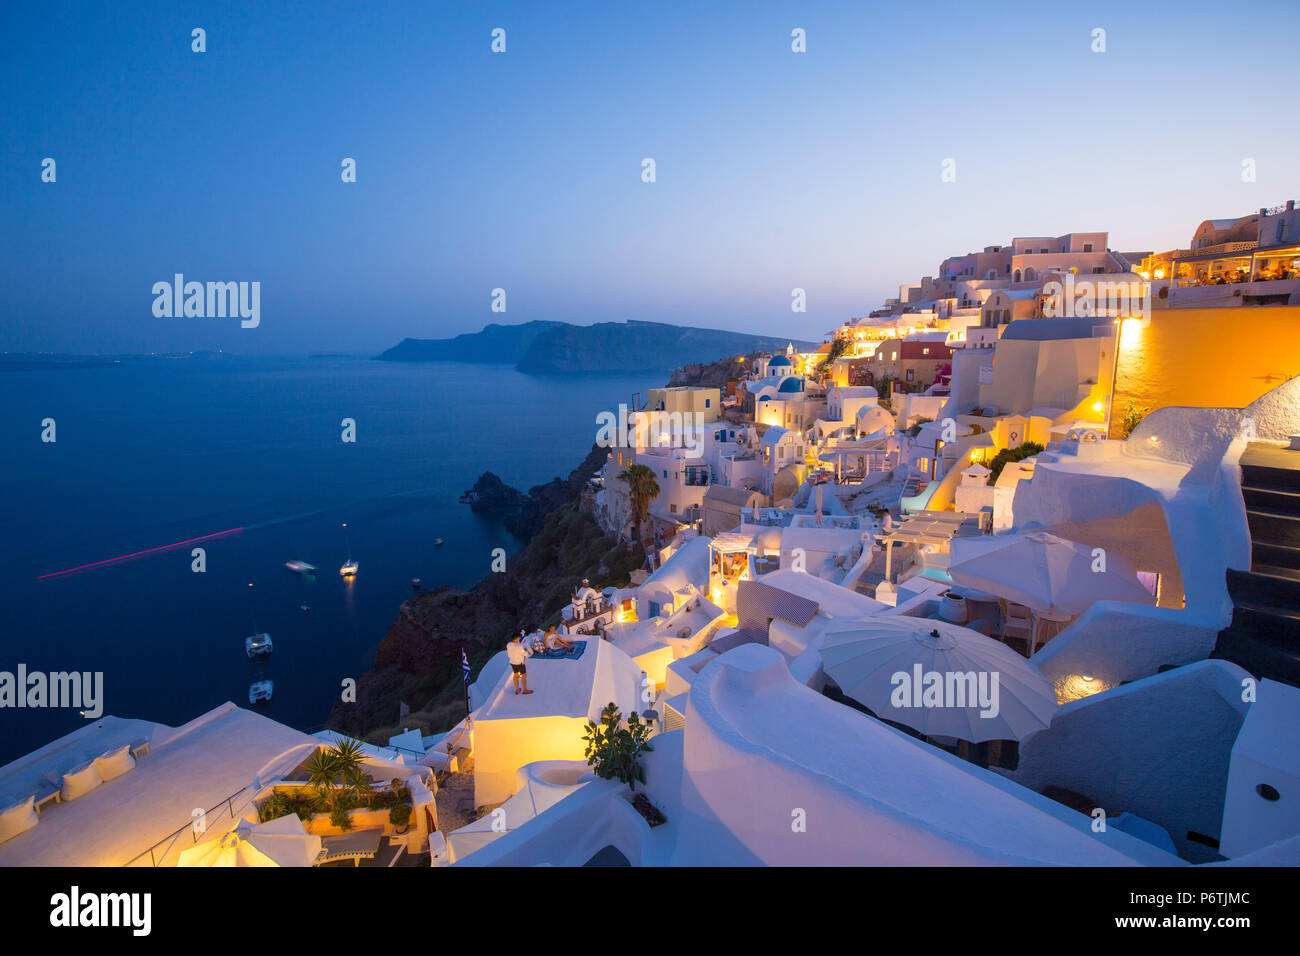 Oia, Santorini (Thira), Cyclades Islands, Greece - Stock Image